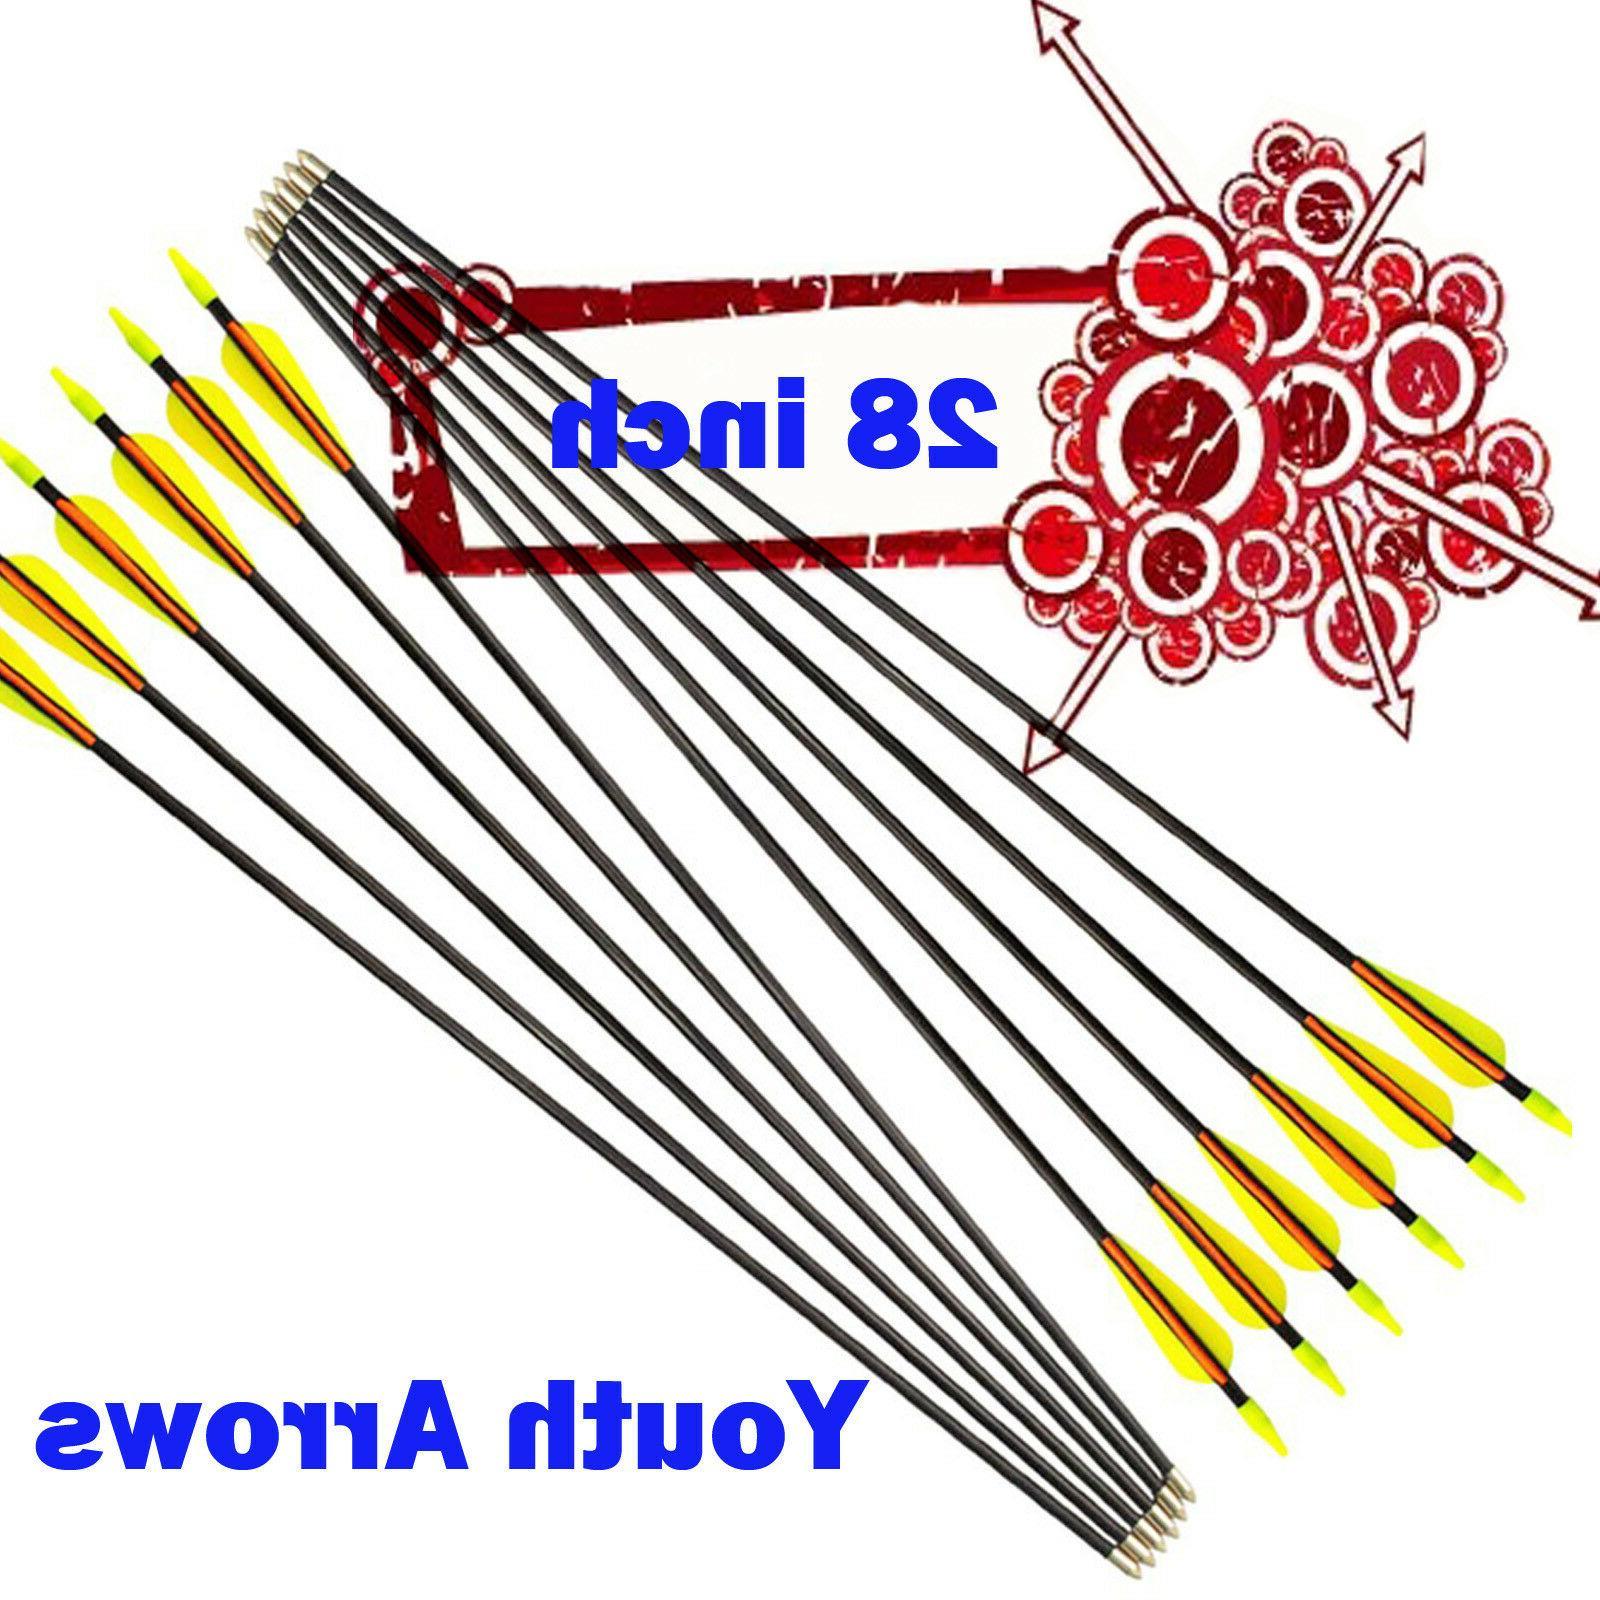 28 fiberglass arrows compound bow youth archery